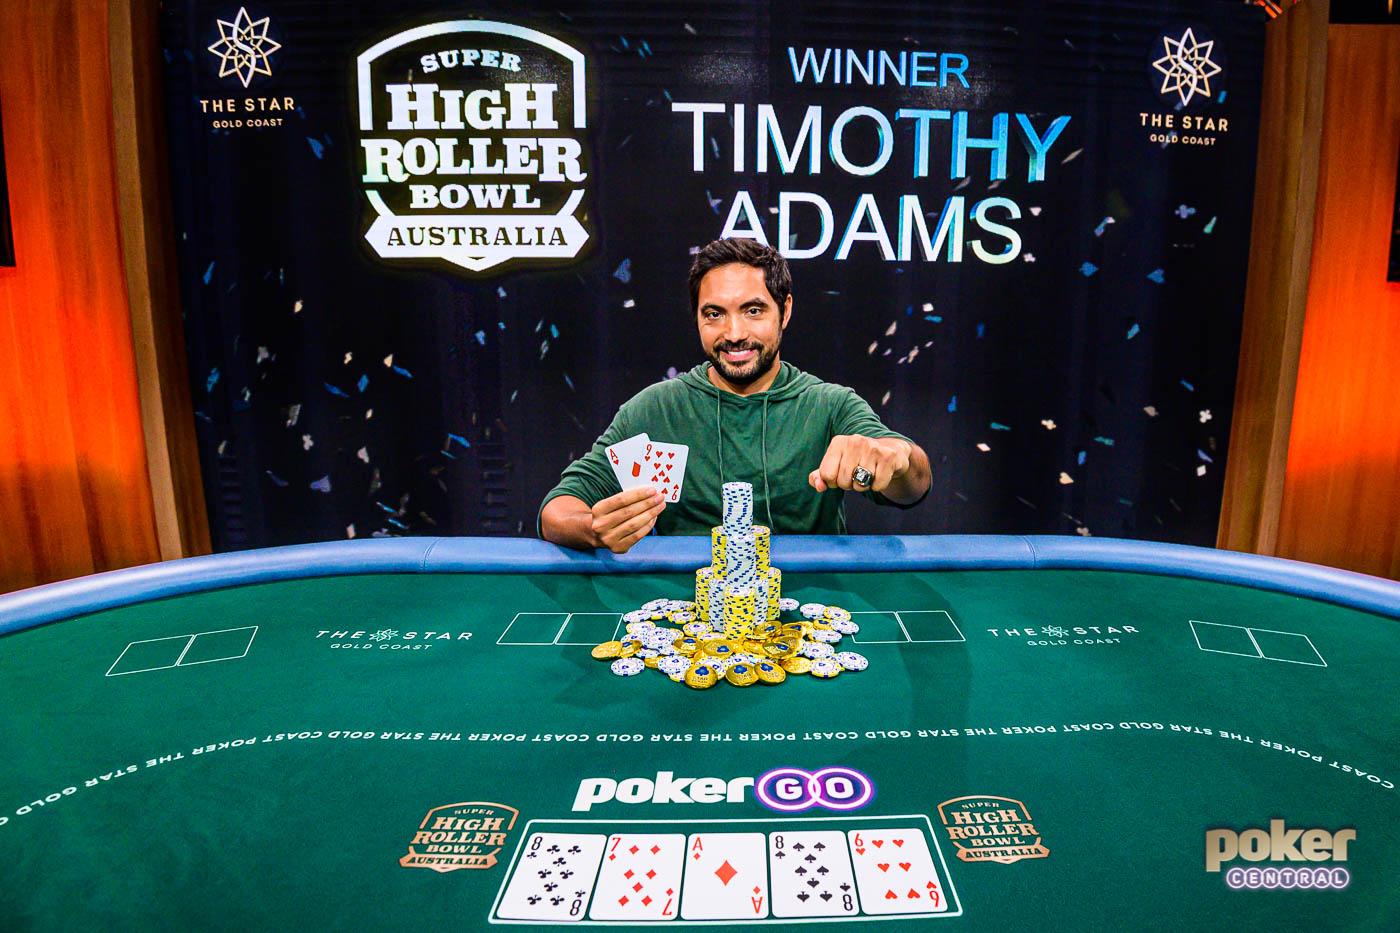 Timothy Adams Wins Inaugural Super High Roller Bowl Australia for  AU$2,160,000 | Poker Central